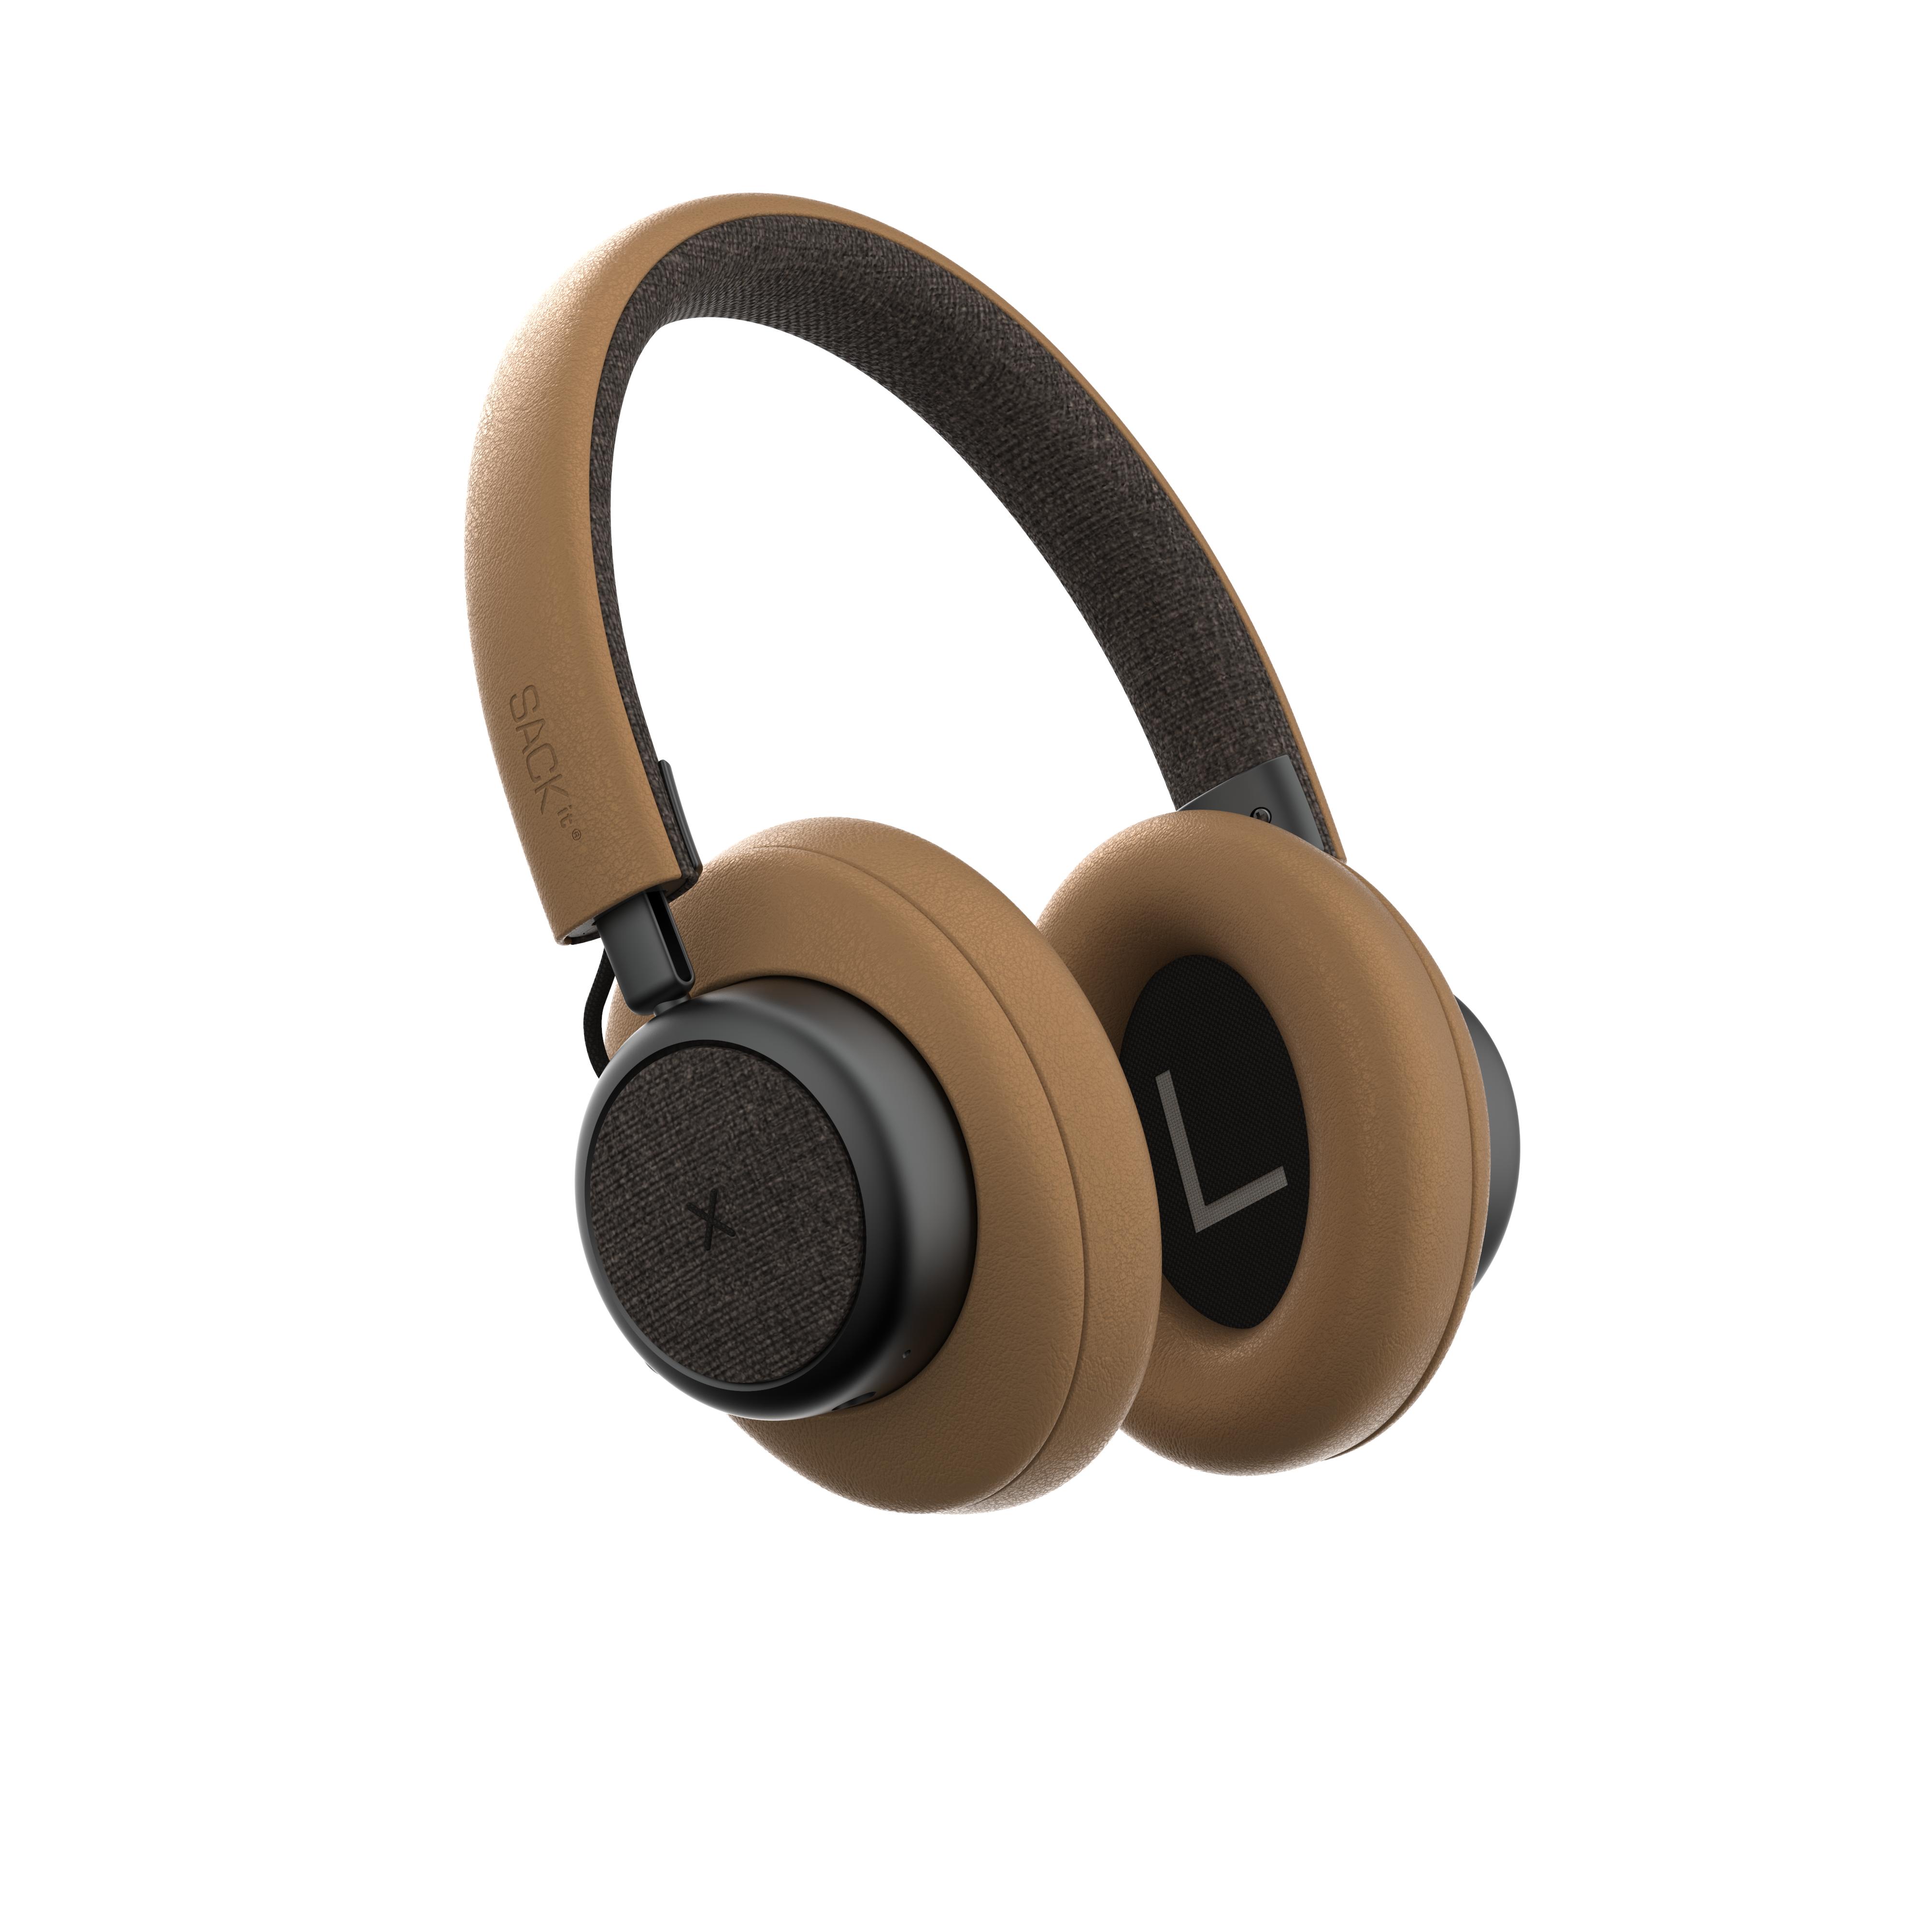 SACKit - TOUCHit Over-Ear Headphones - Golden